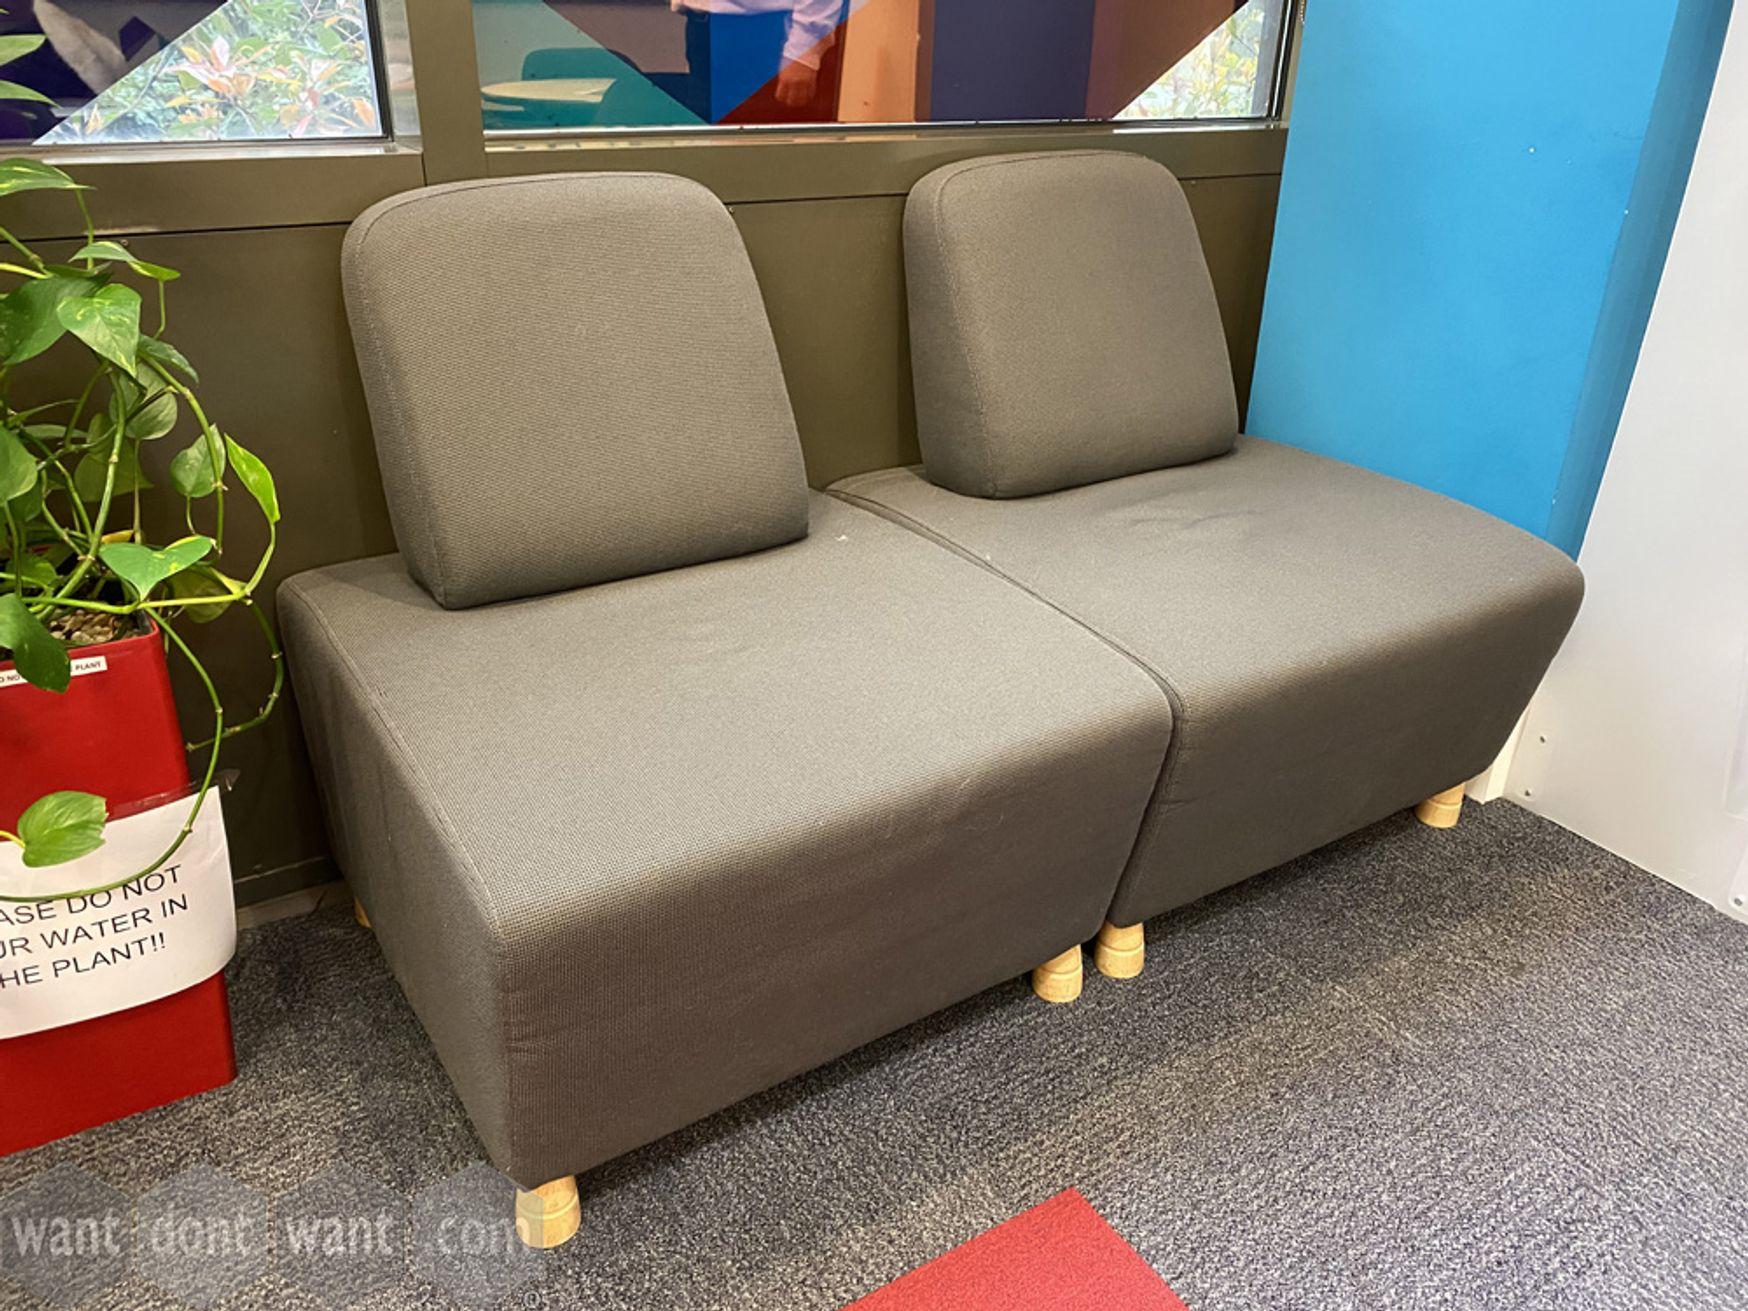 Used Boss Design 'Adda' single seat modules to match the sofas